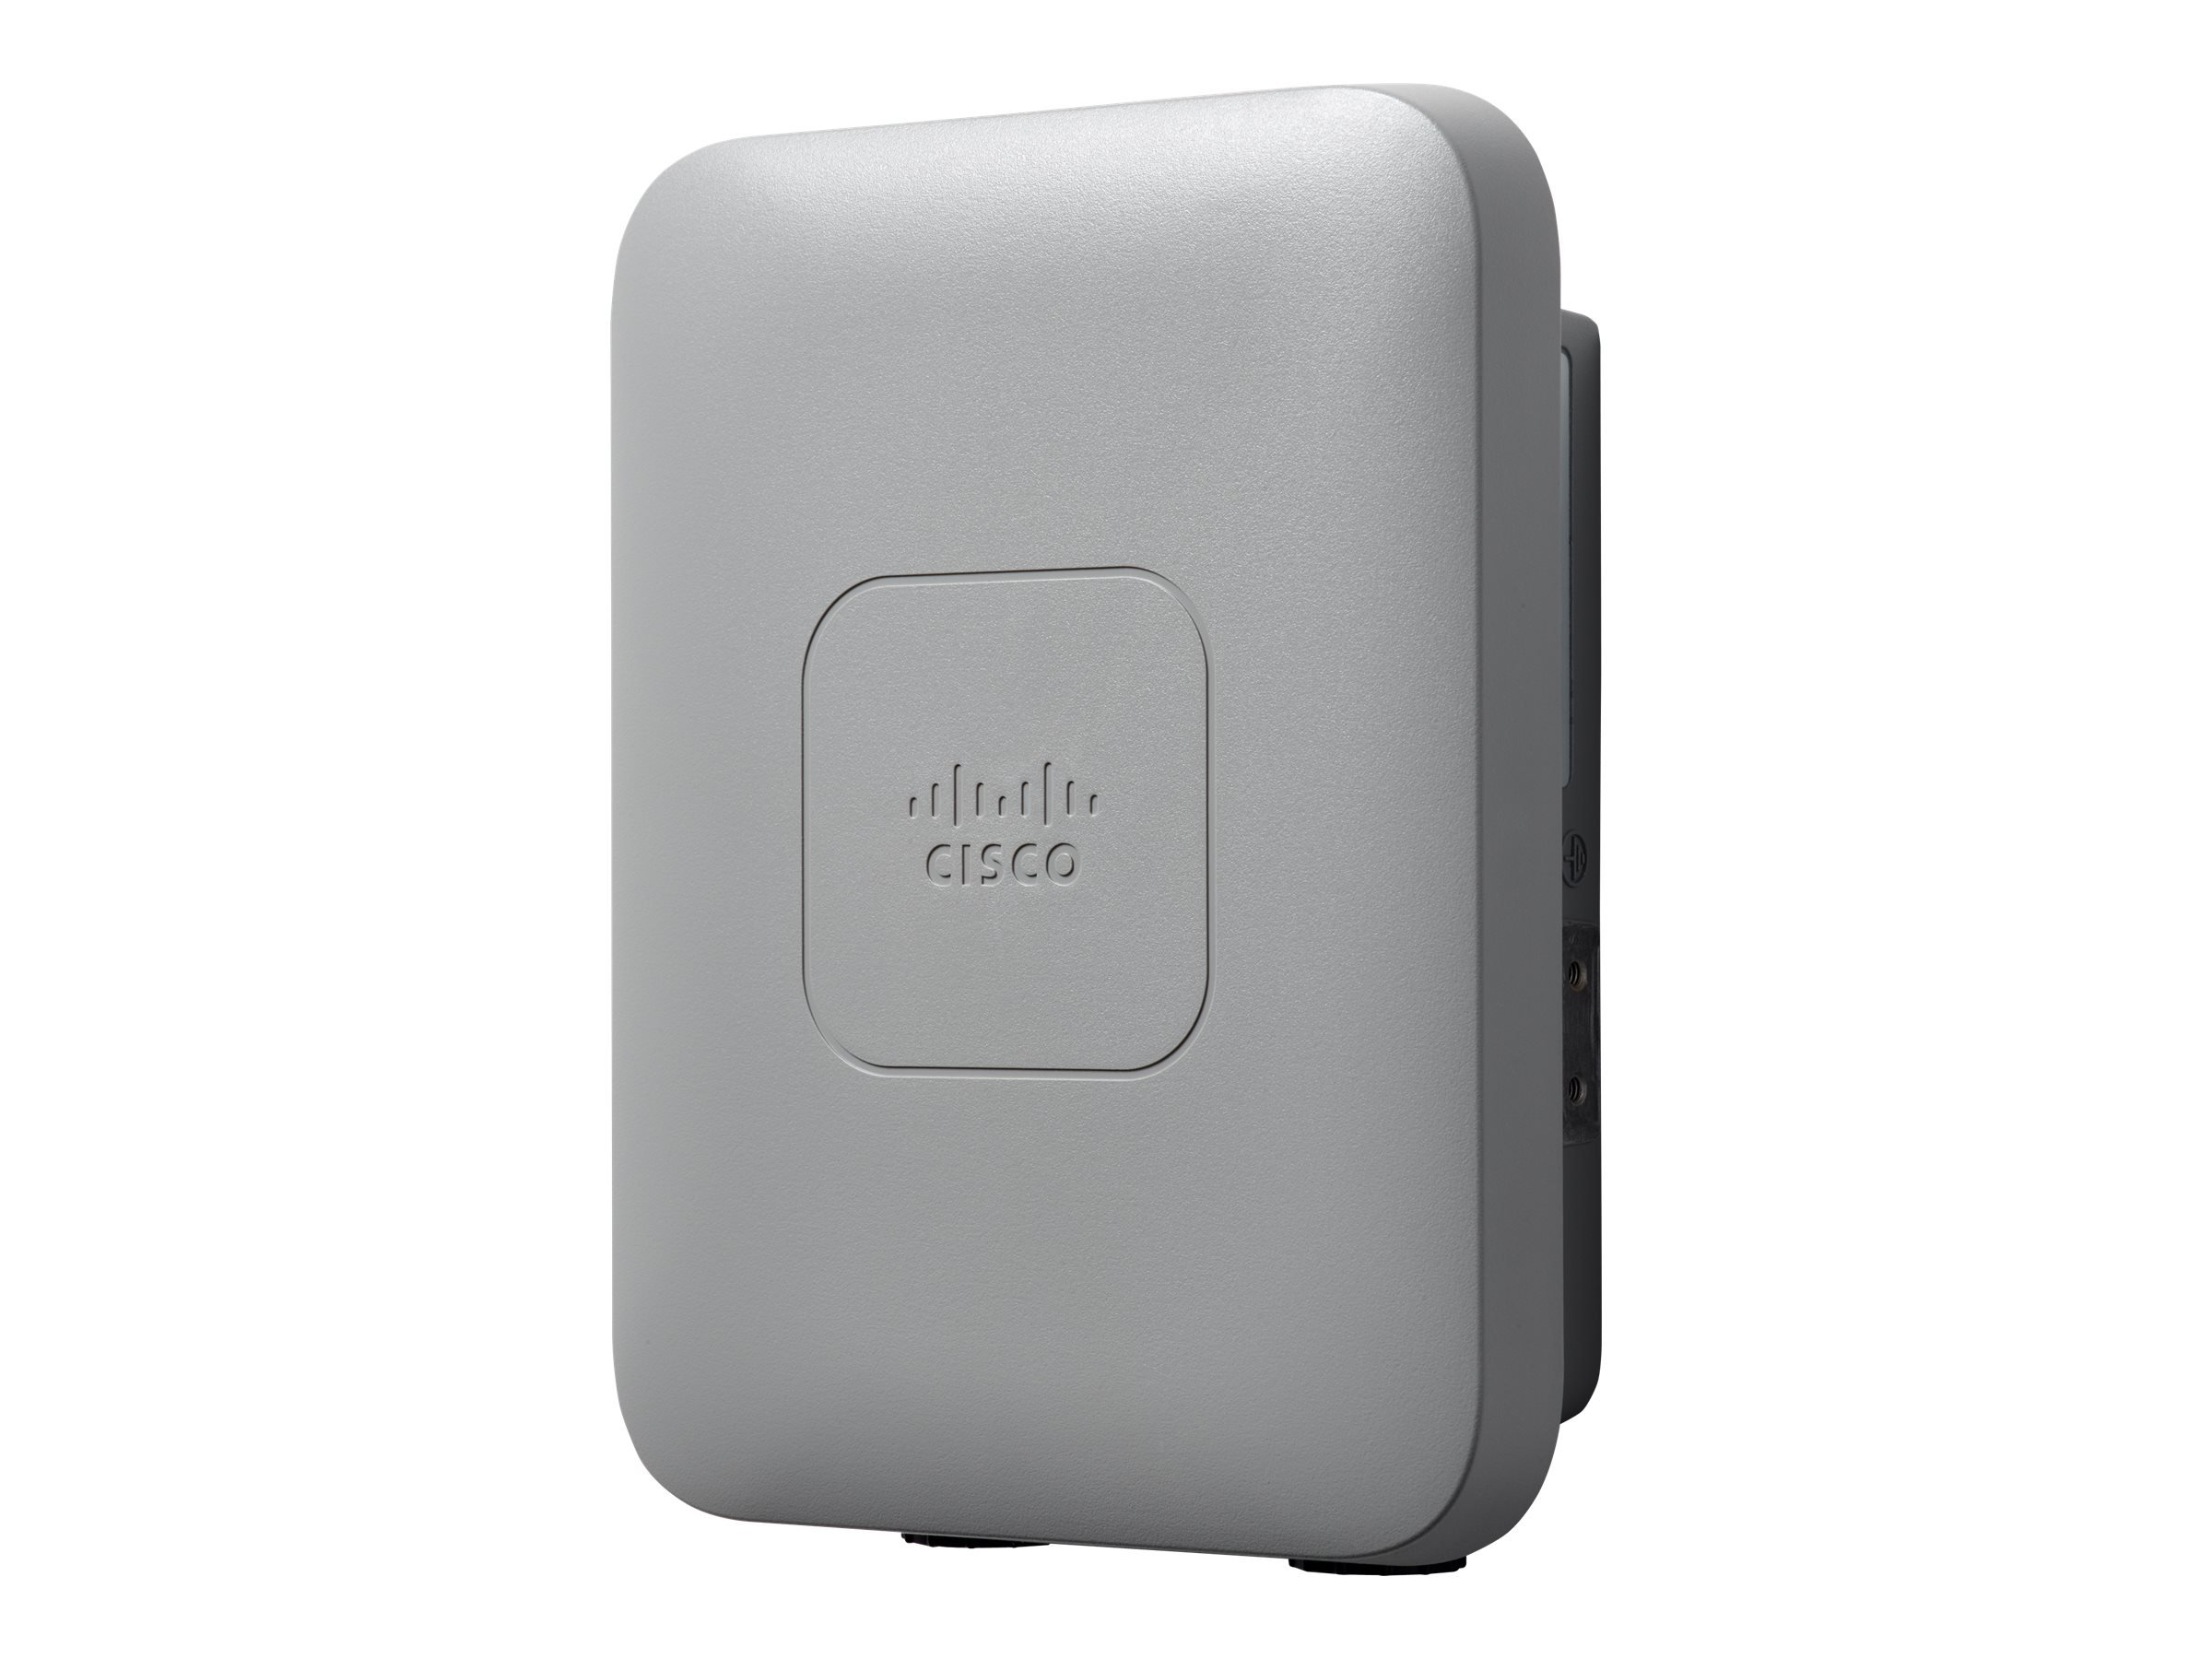 Cisco Aironet 1562D IEEE 802.11ac 1.30 Gbit/s Wireless Access Point by Cisco